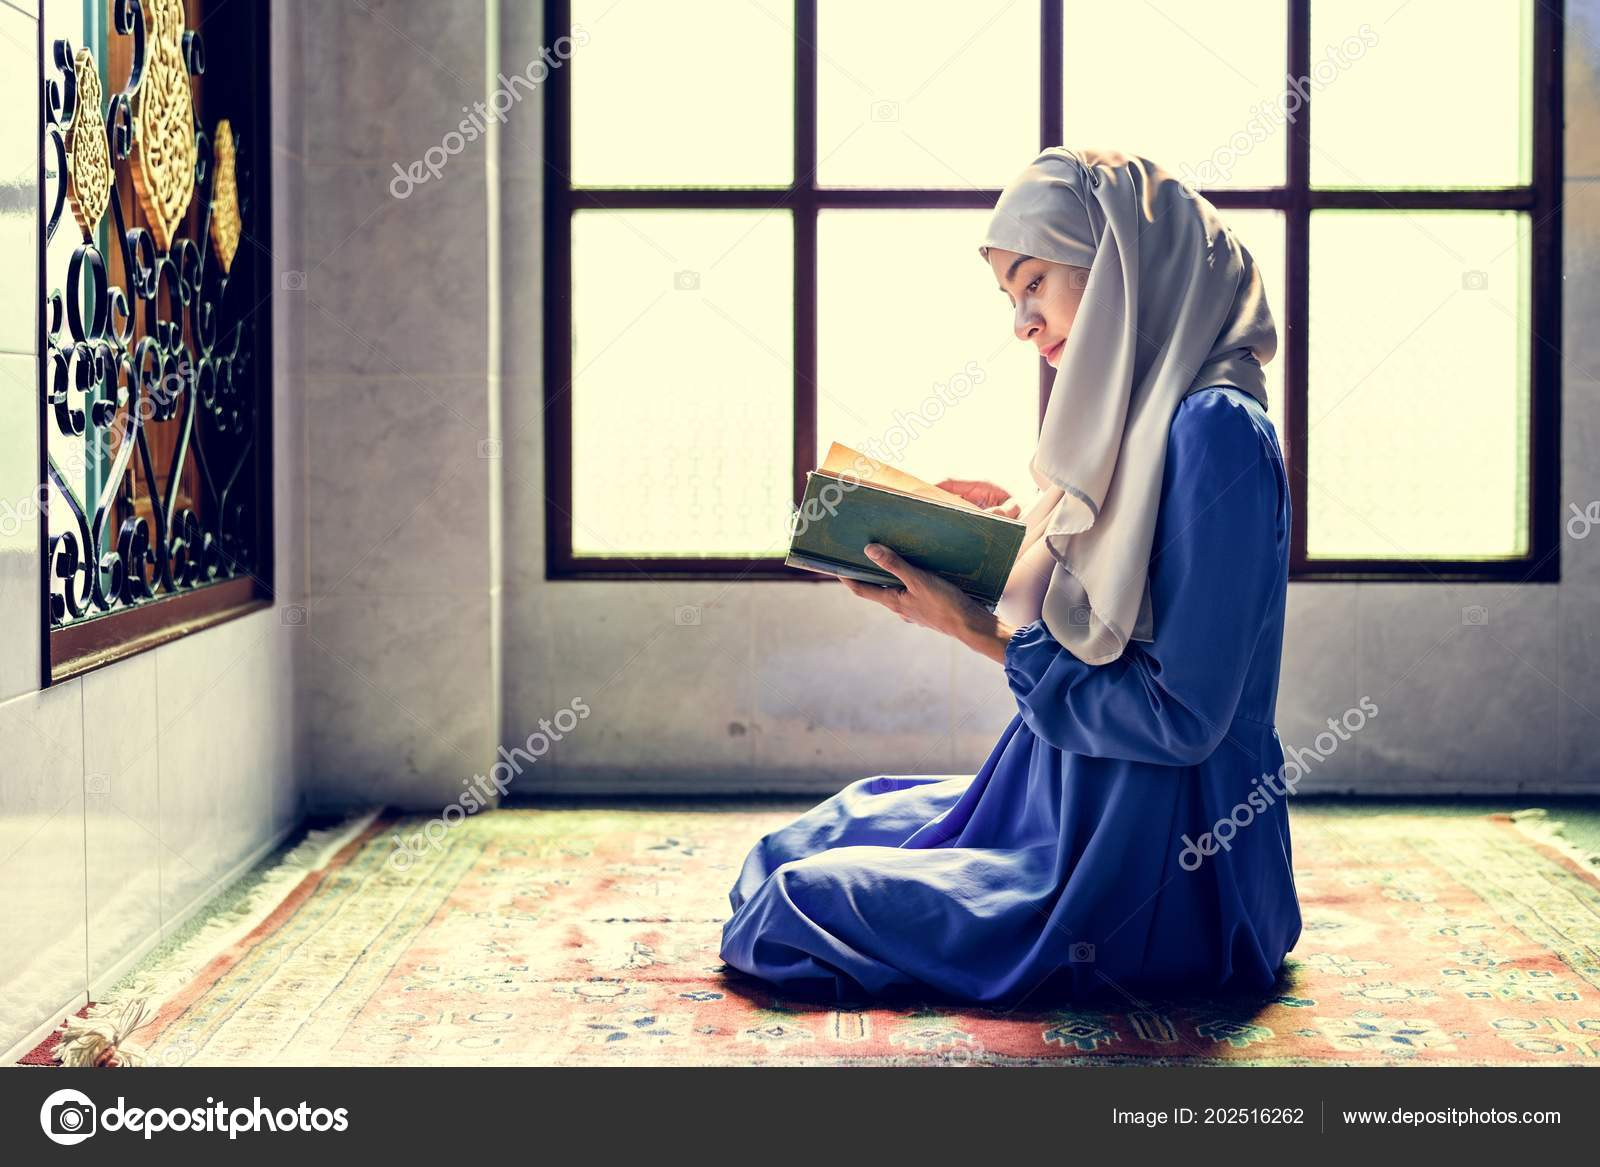 Muslim Woman Reading Quran — Stock Photo © Rawpixel #202516262